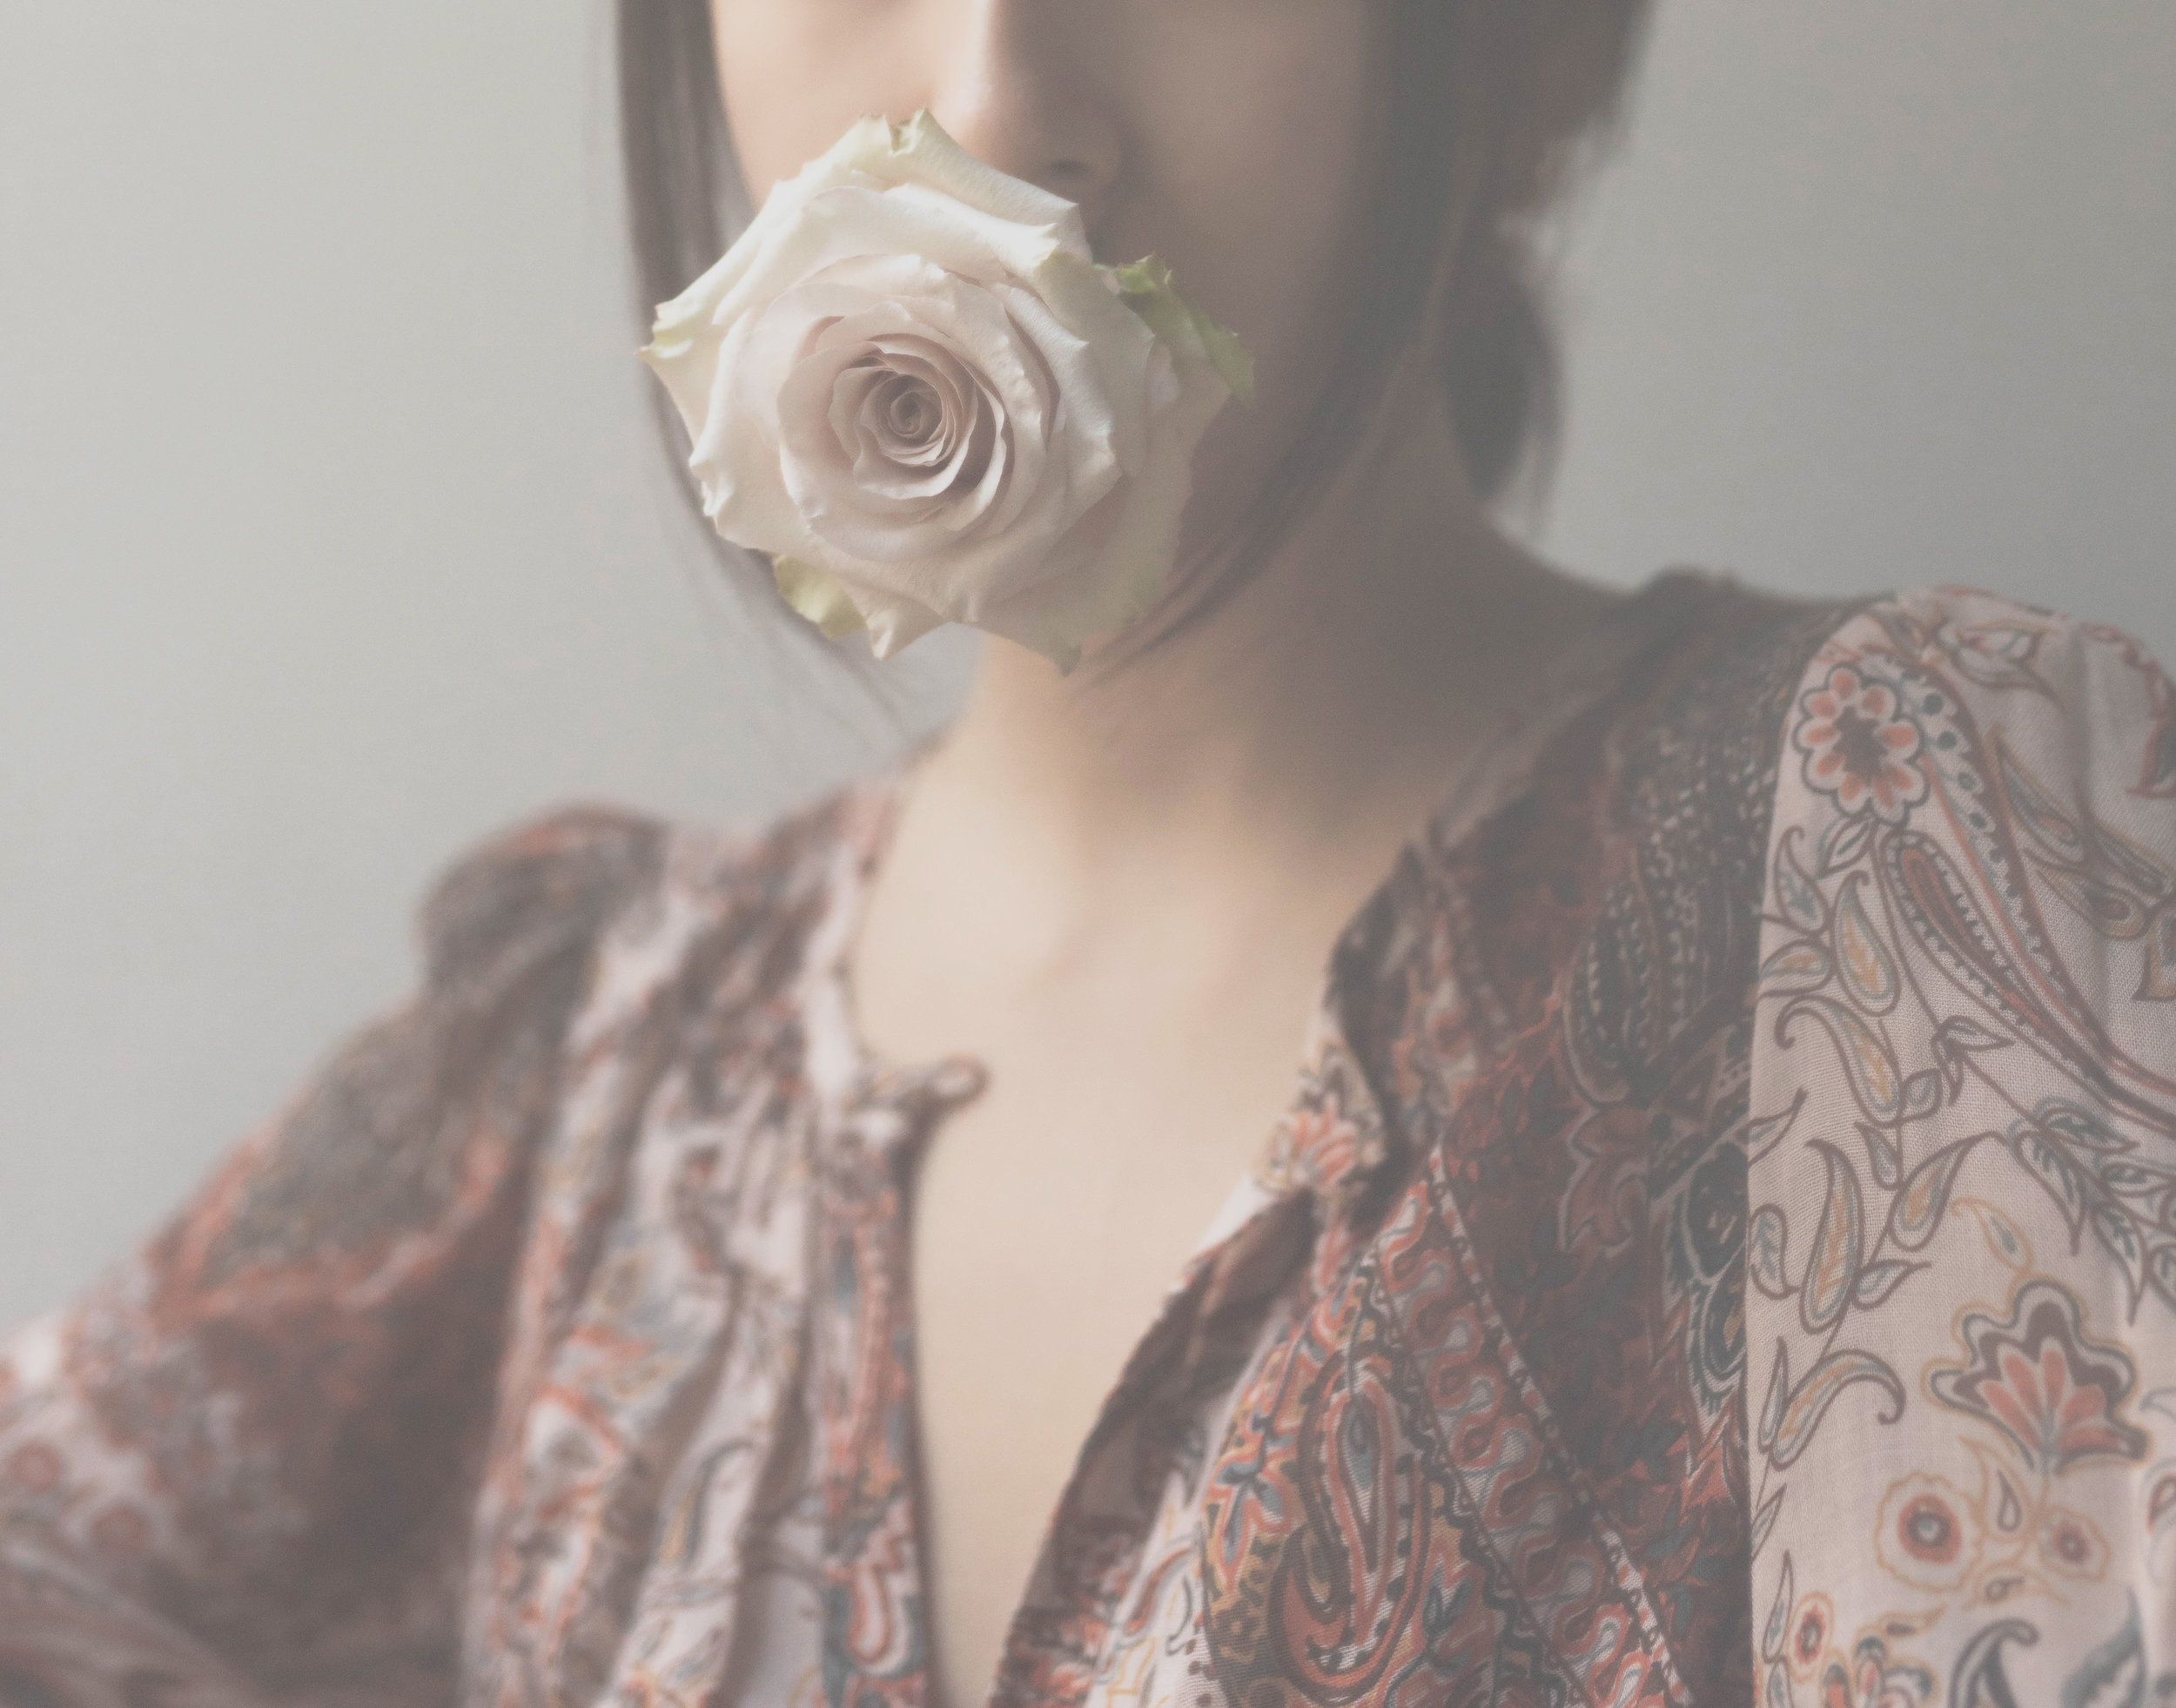 Stella_Rose_20.jpg